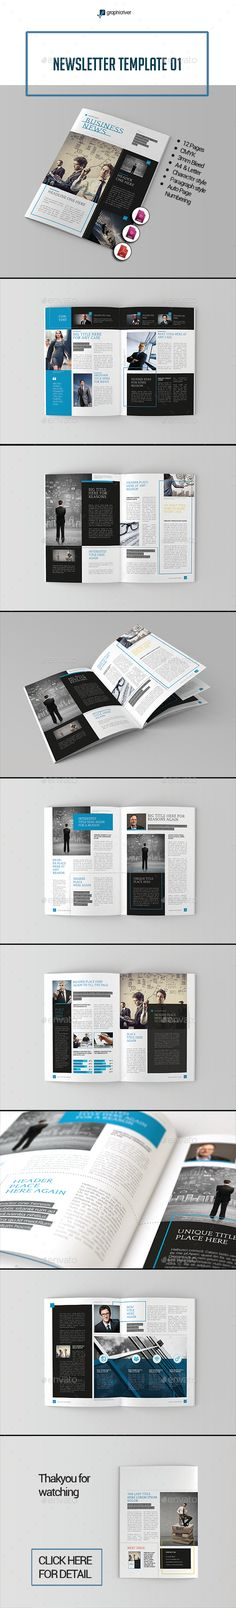 Newsletter Template InDesign INDD #design Download: http://graphicriver.net/item/newsletter-template-01/14048985?ref=ksioks